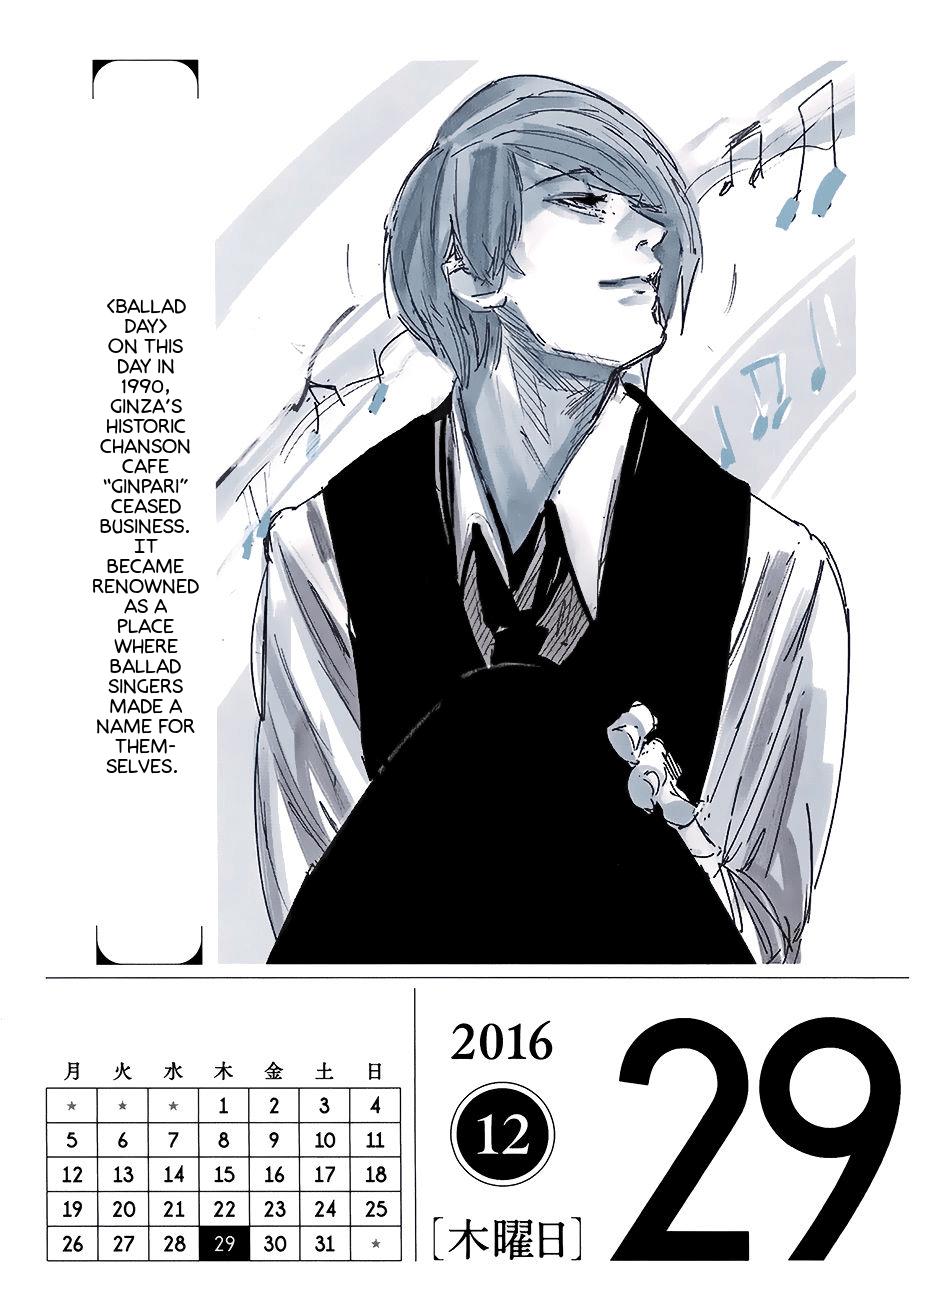 Tokyo Ghoul 366 Days Calendar 2016 December Album on